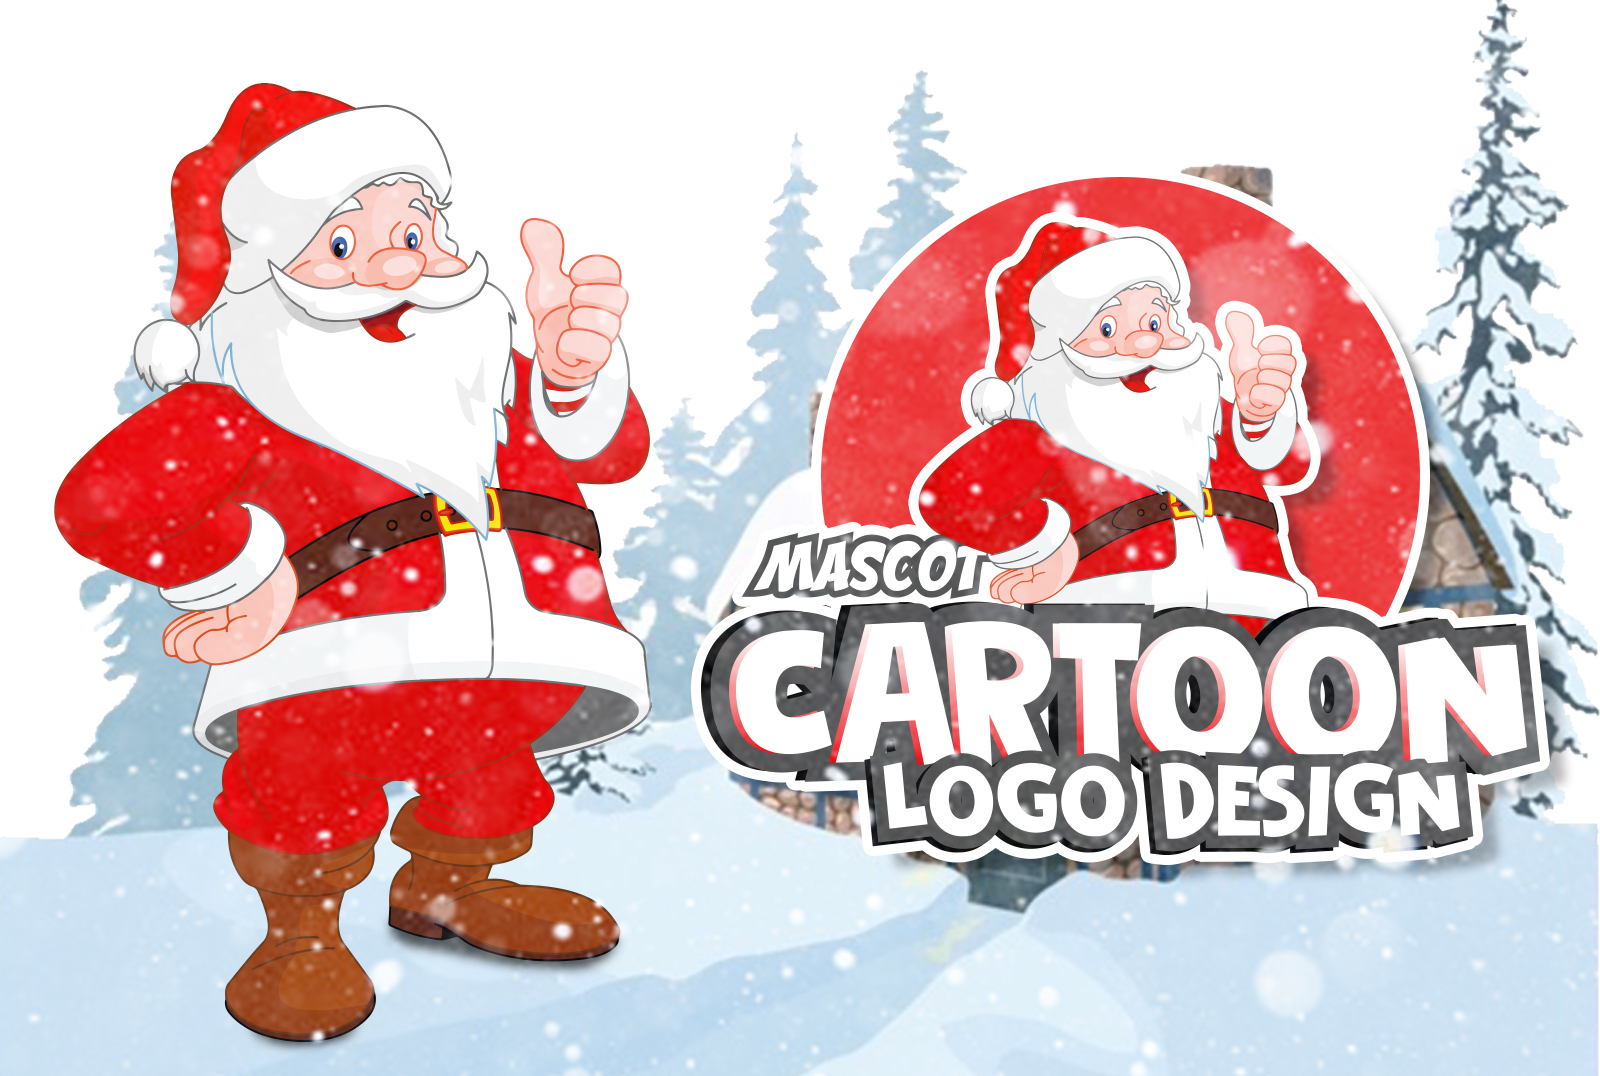 I will draw cute cartoon character and mascot logo design